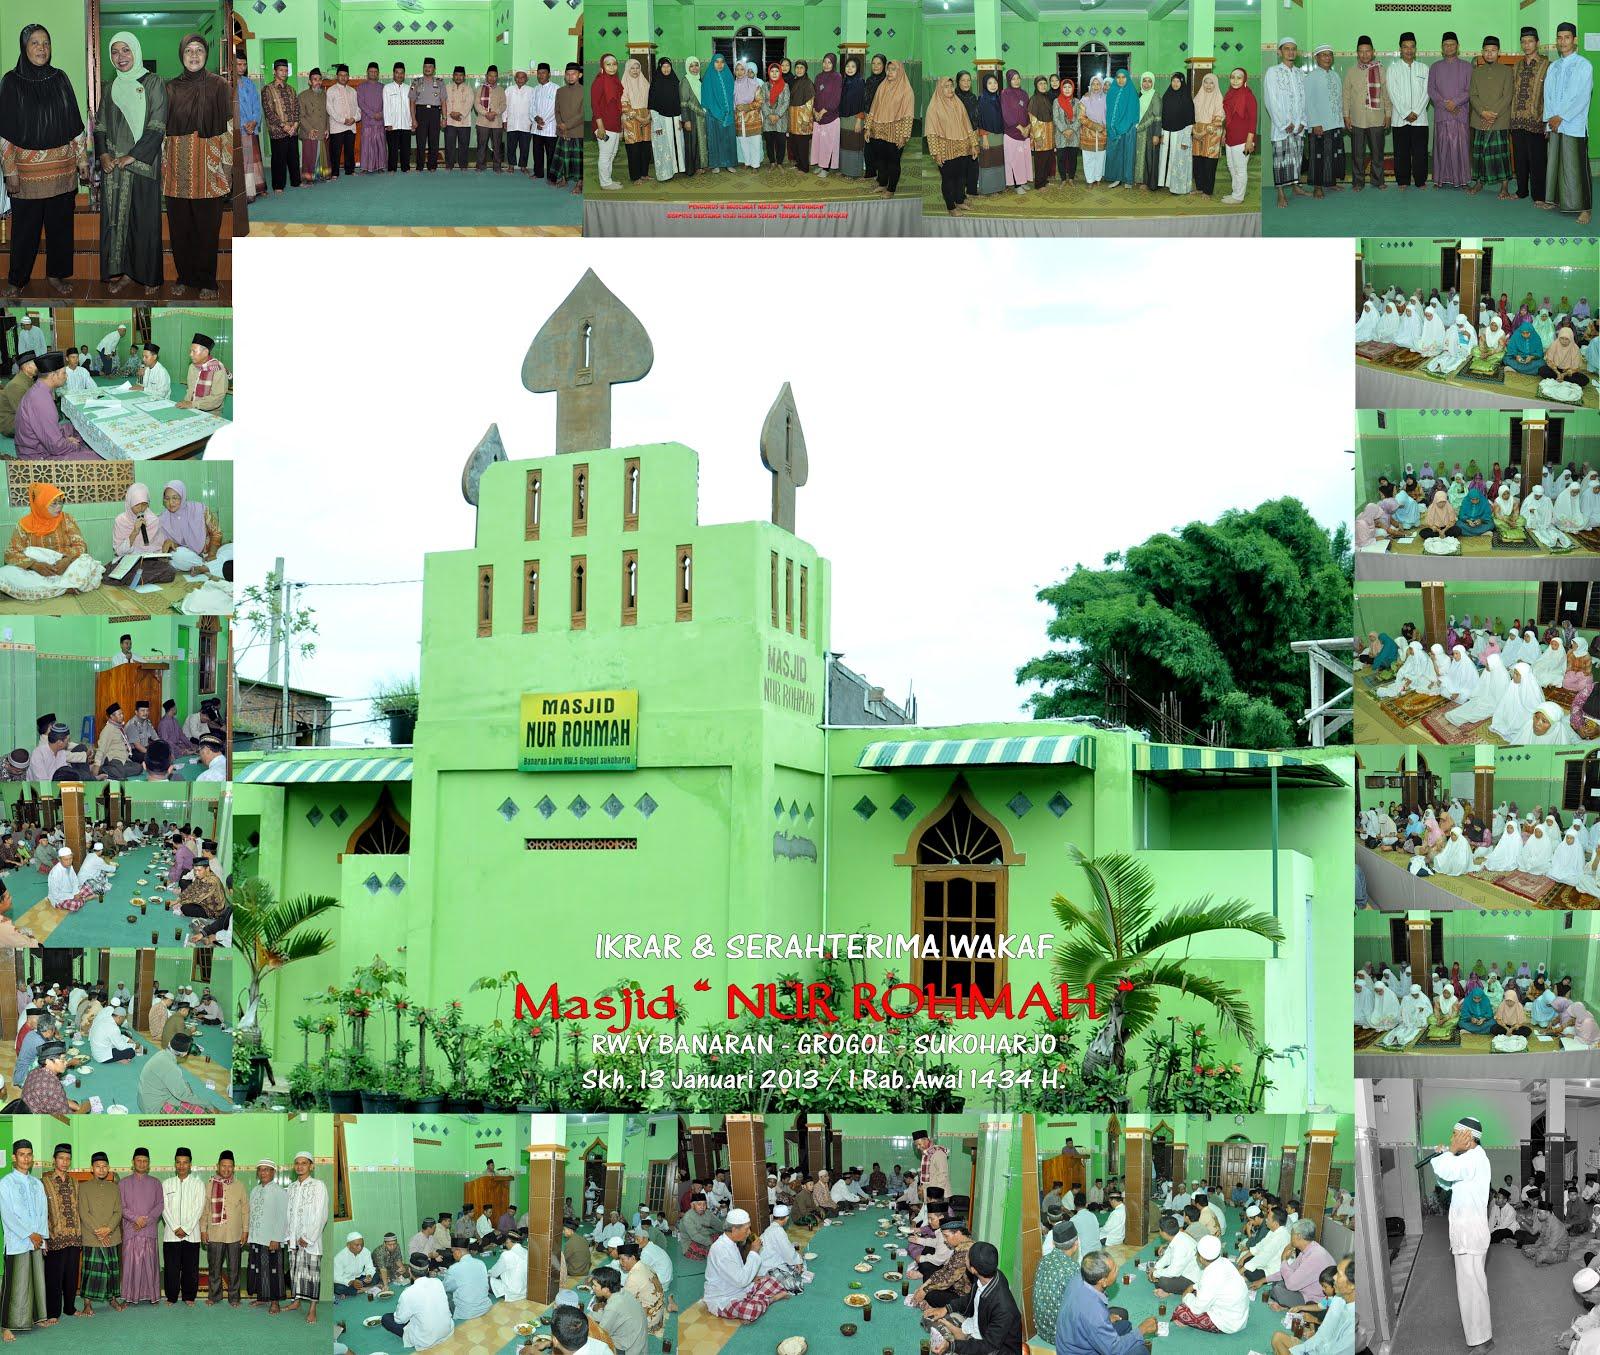 Masjid Nur Rohmah